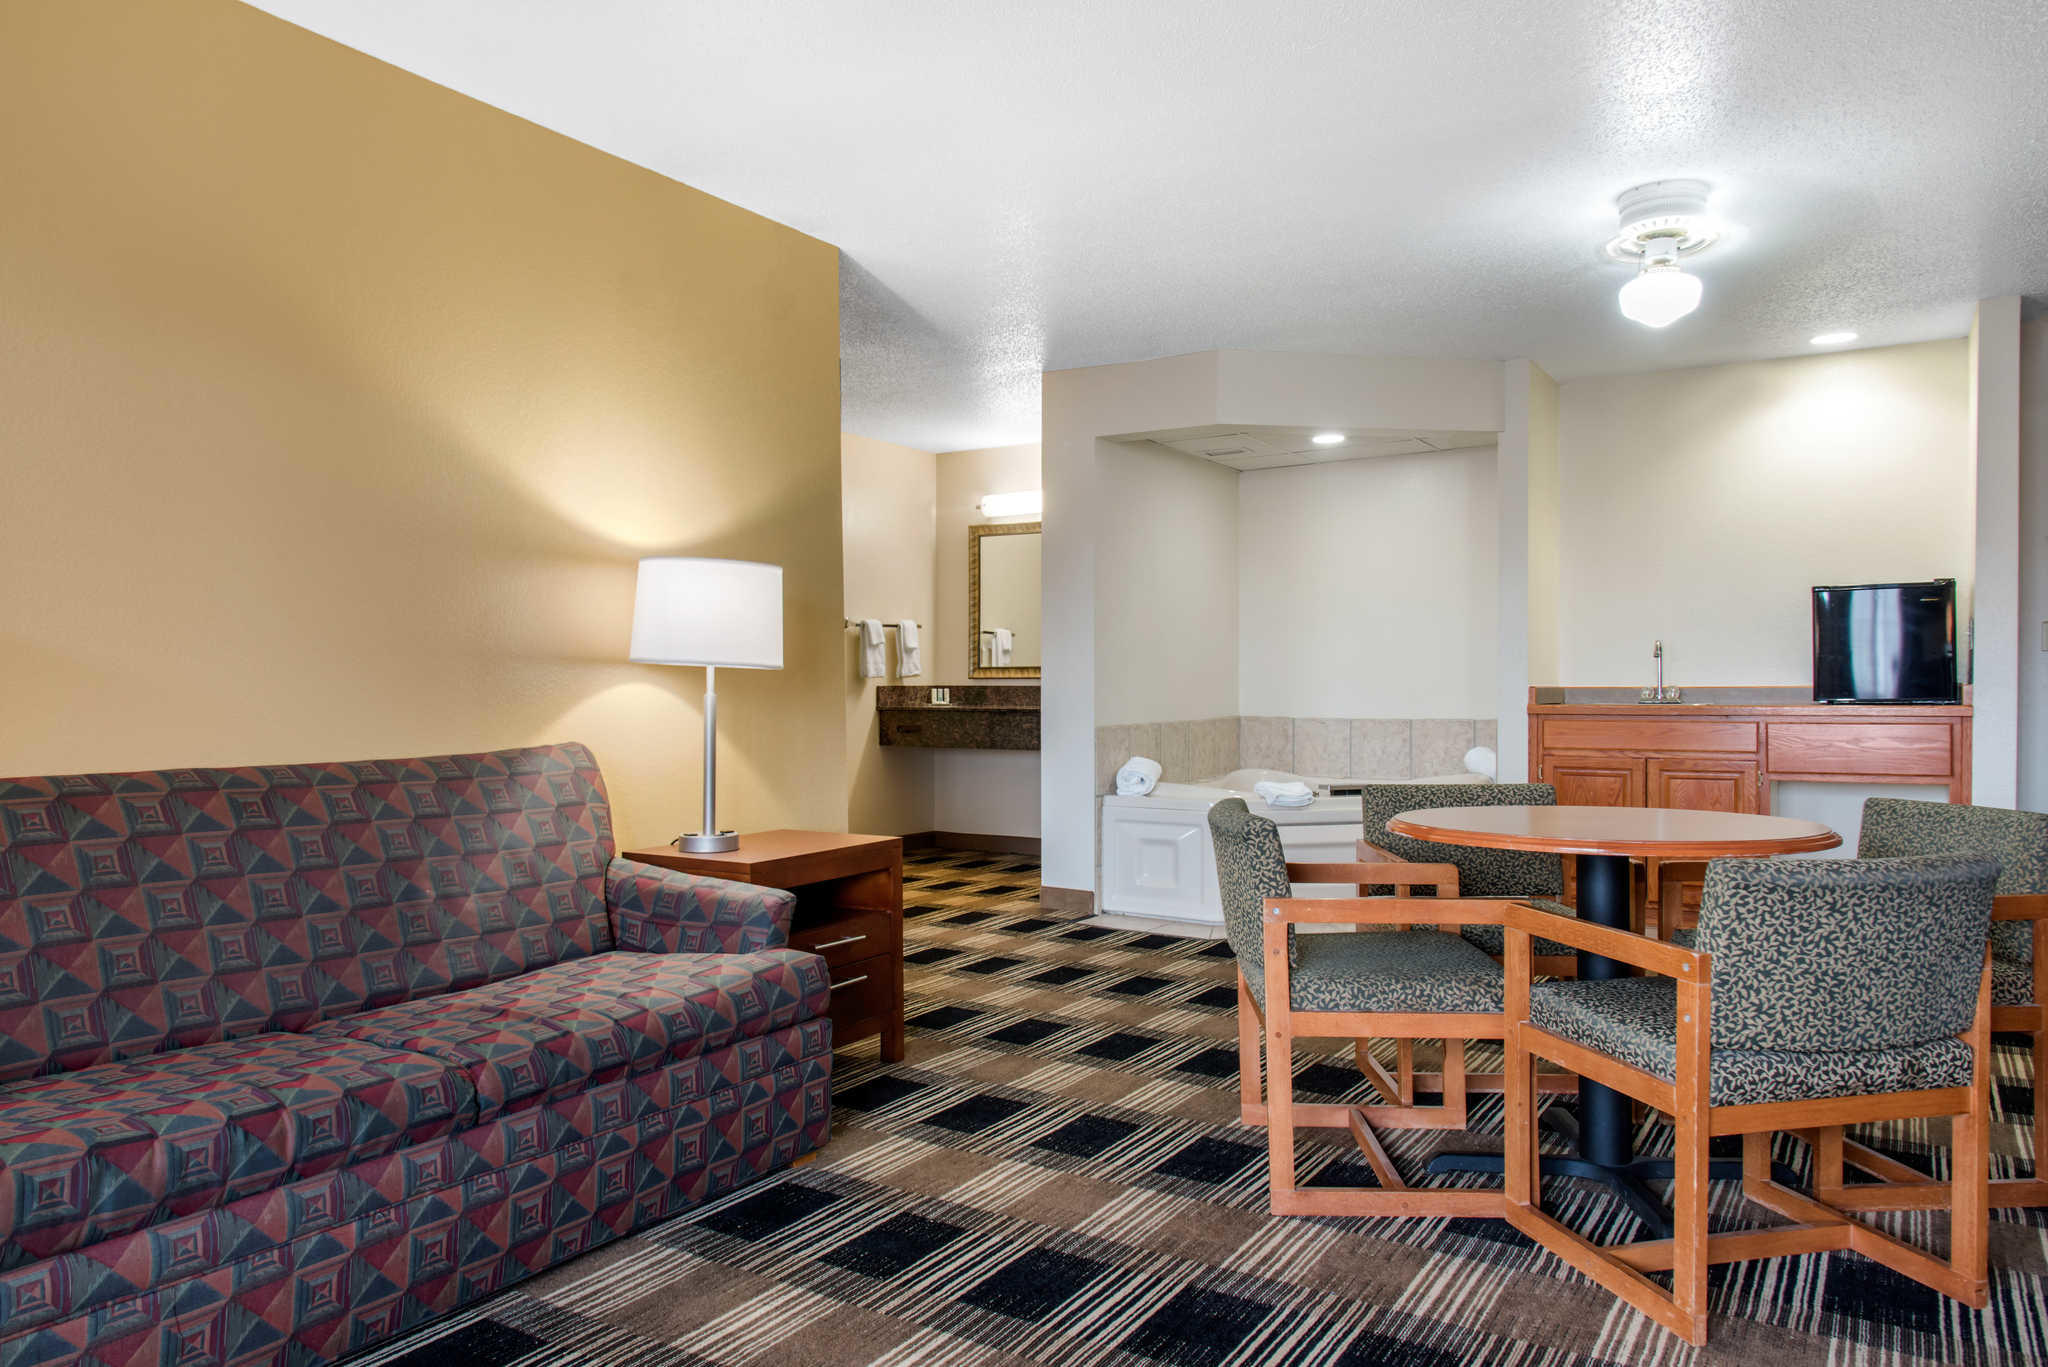 Quality Inn image 25